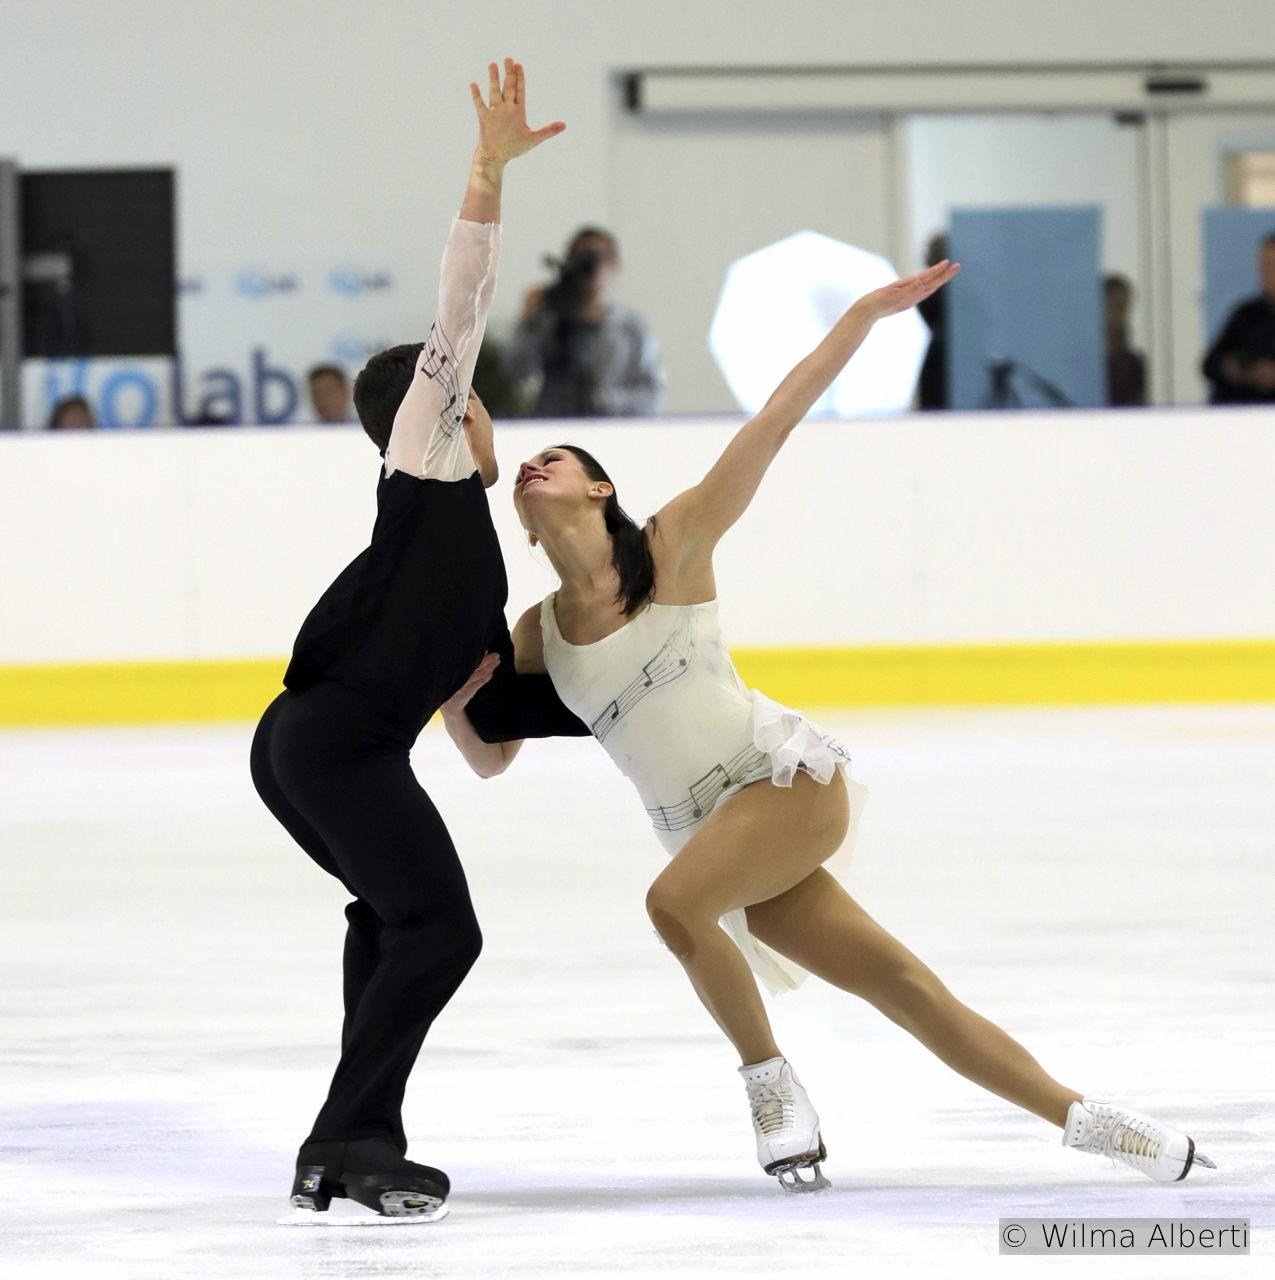 Charlene Guignard and Marco Fabbri FD (4)